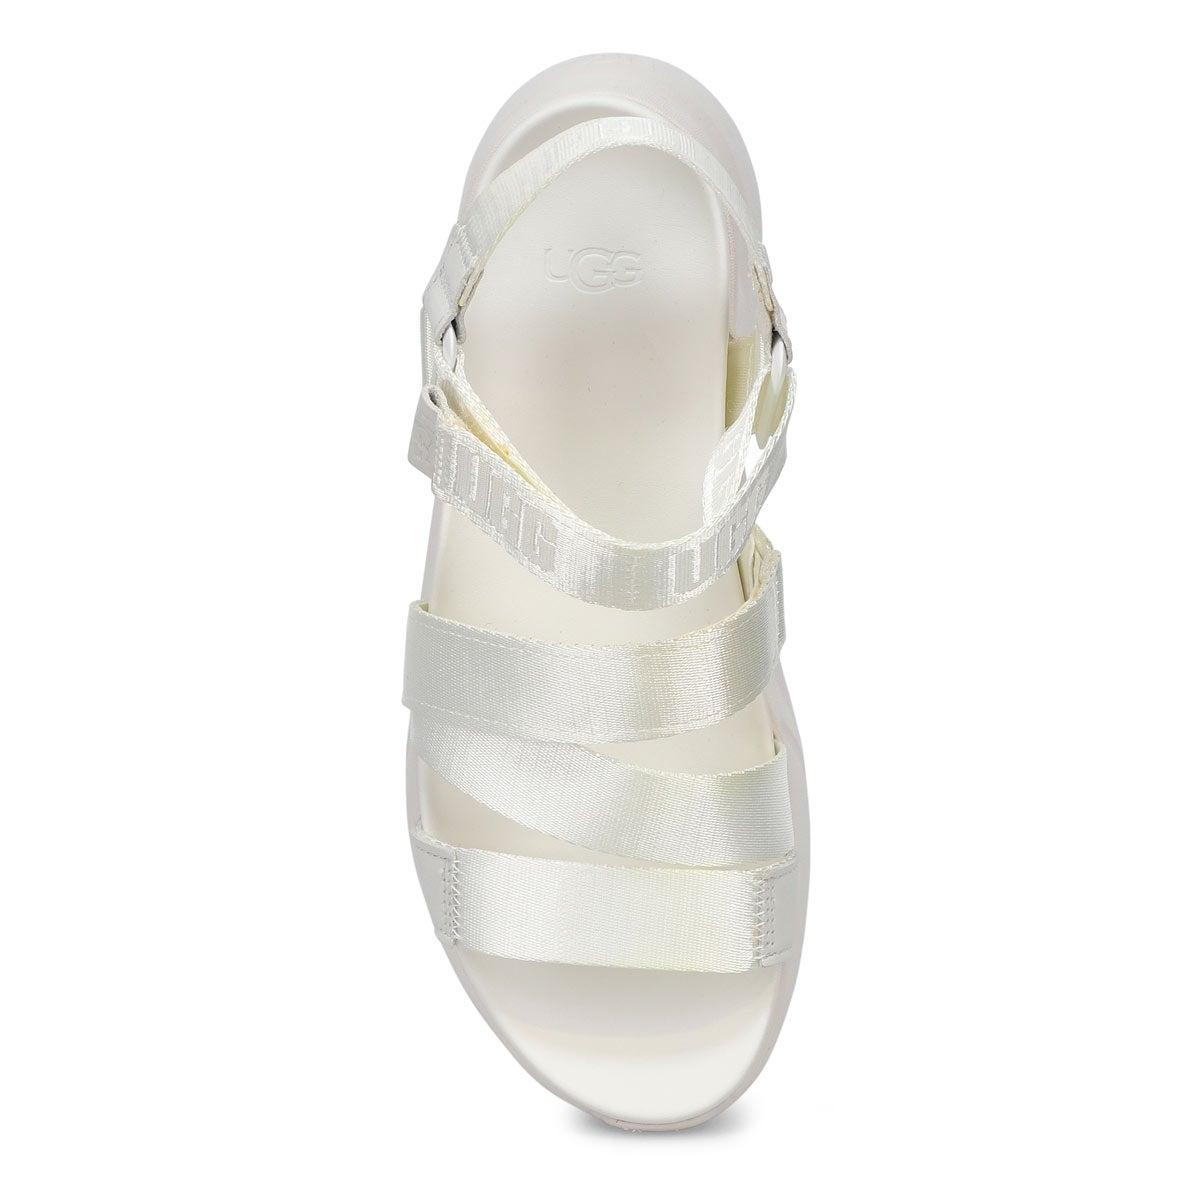 Women's La Shore Sandal - White